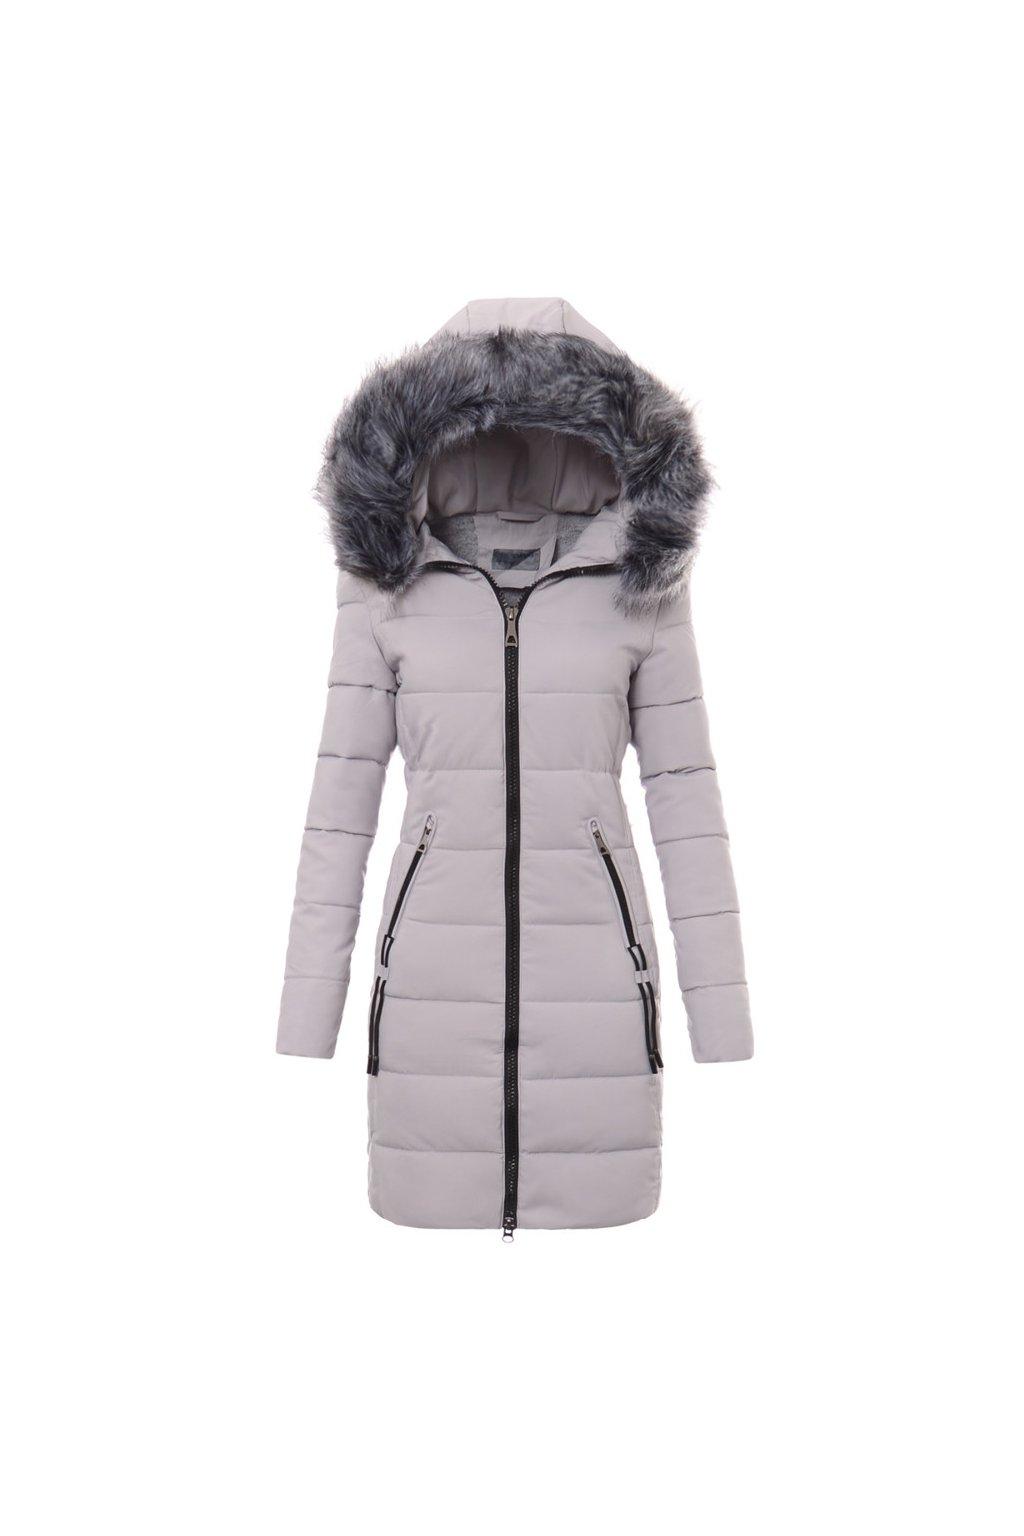 Dámska dlhá zimná bunda s kapucňou 3484 šedá